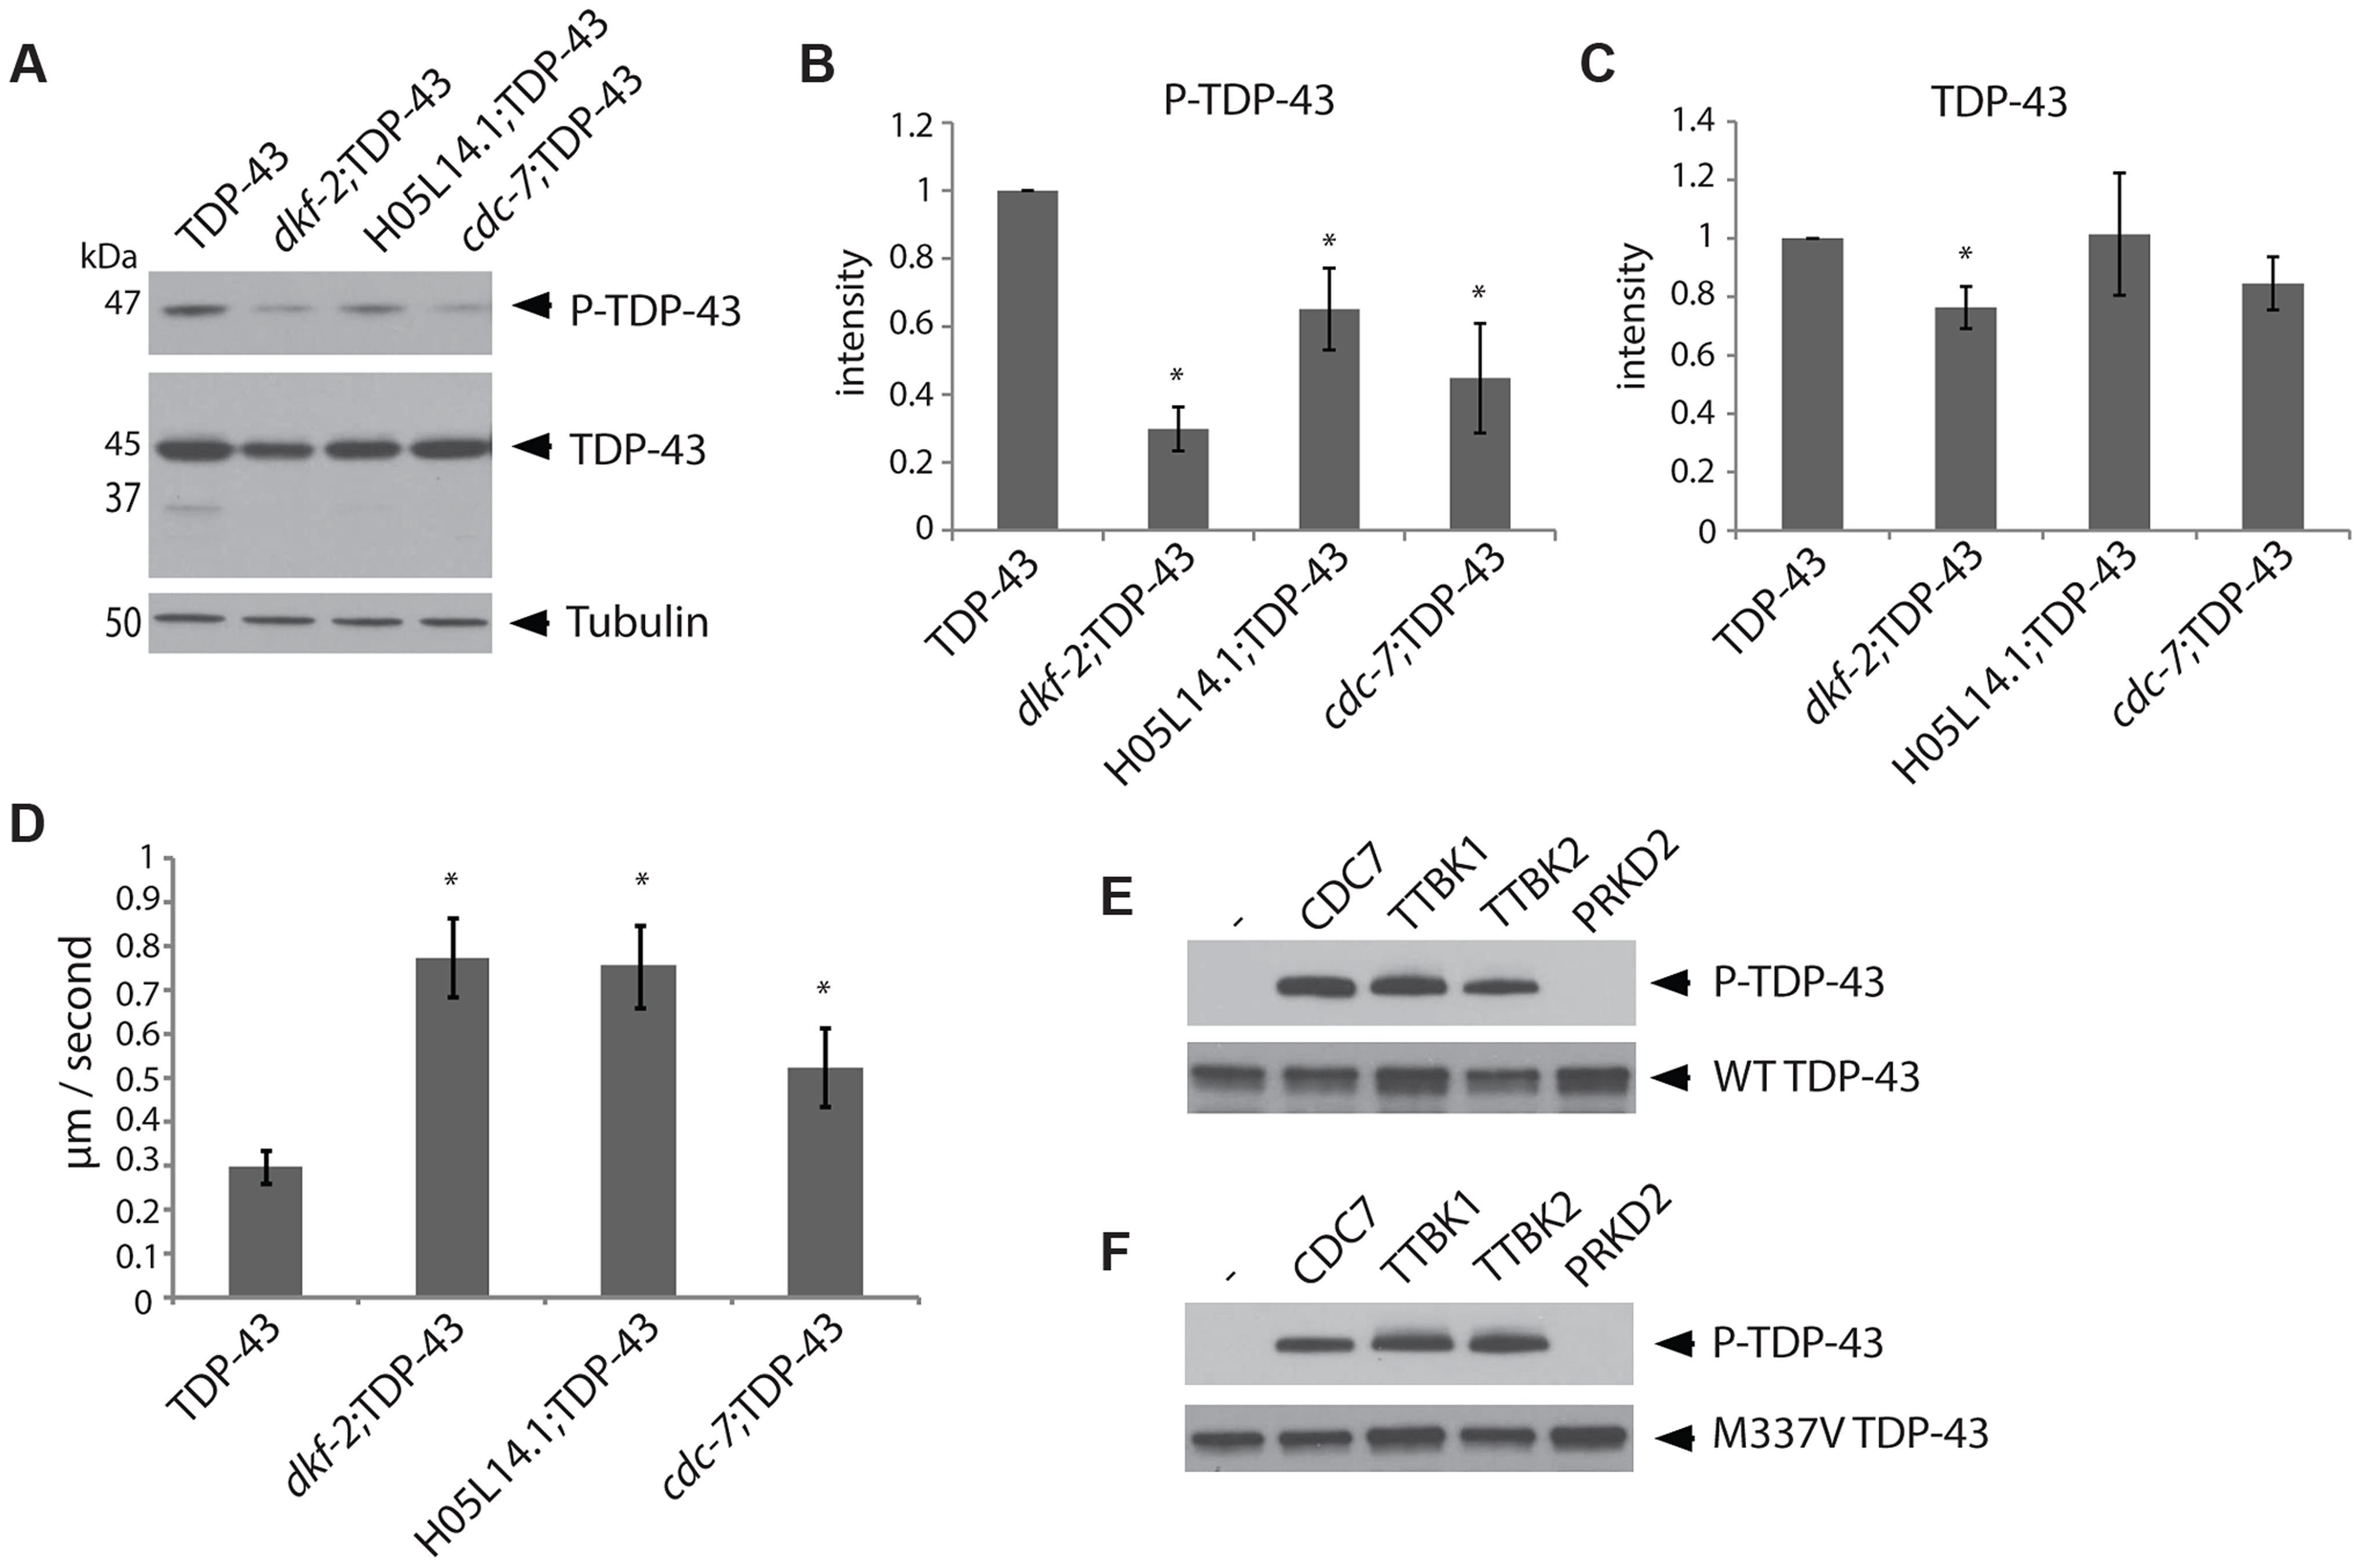 The kinases TTBK1/2 phosphorylate TDP-43 in <i>C. elegans</i> and <i>in vitro</i>.